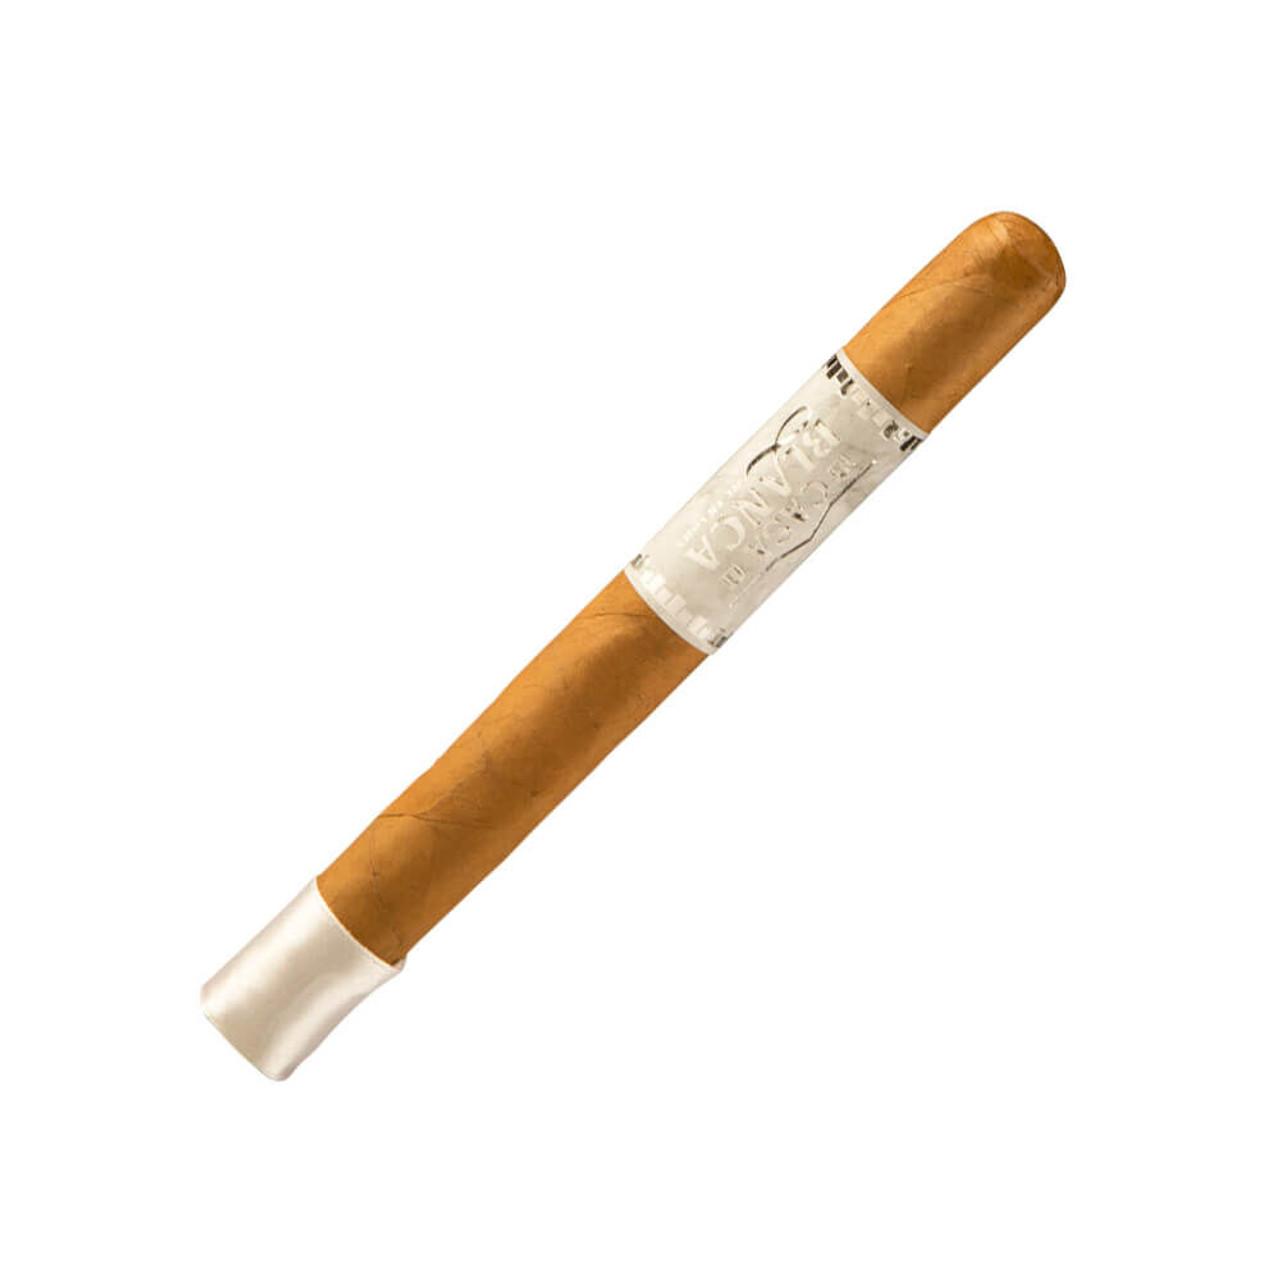 Casa Blanca Nicaragua Lonsdale Natural Cigars - 6.5 x 43 (Box of 20)